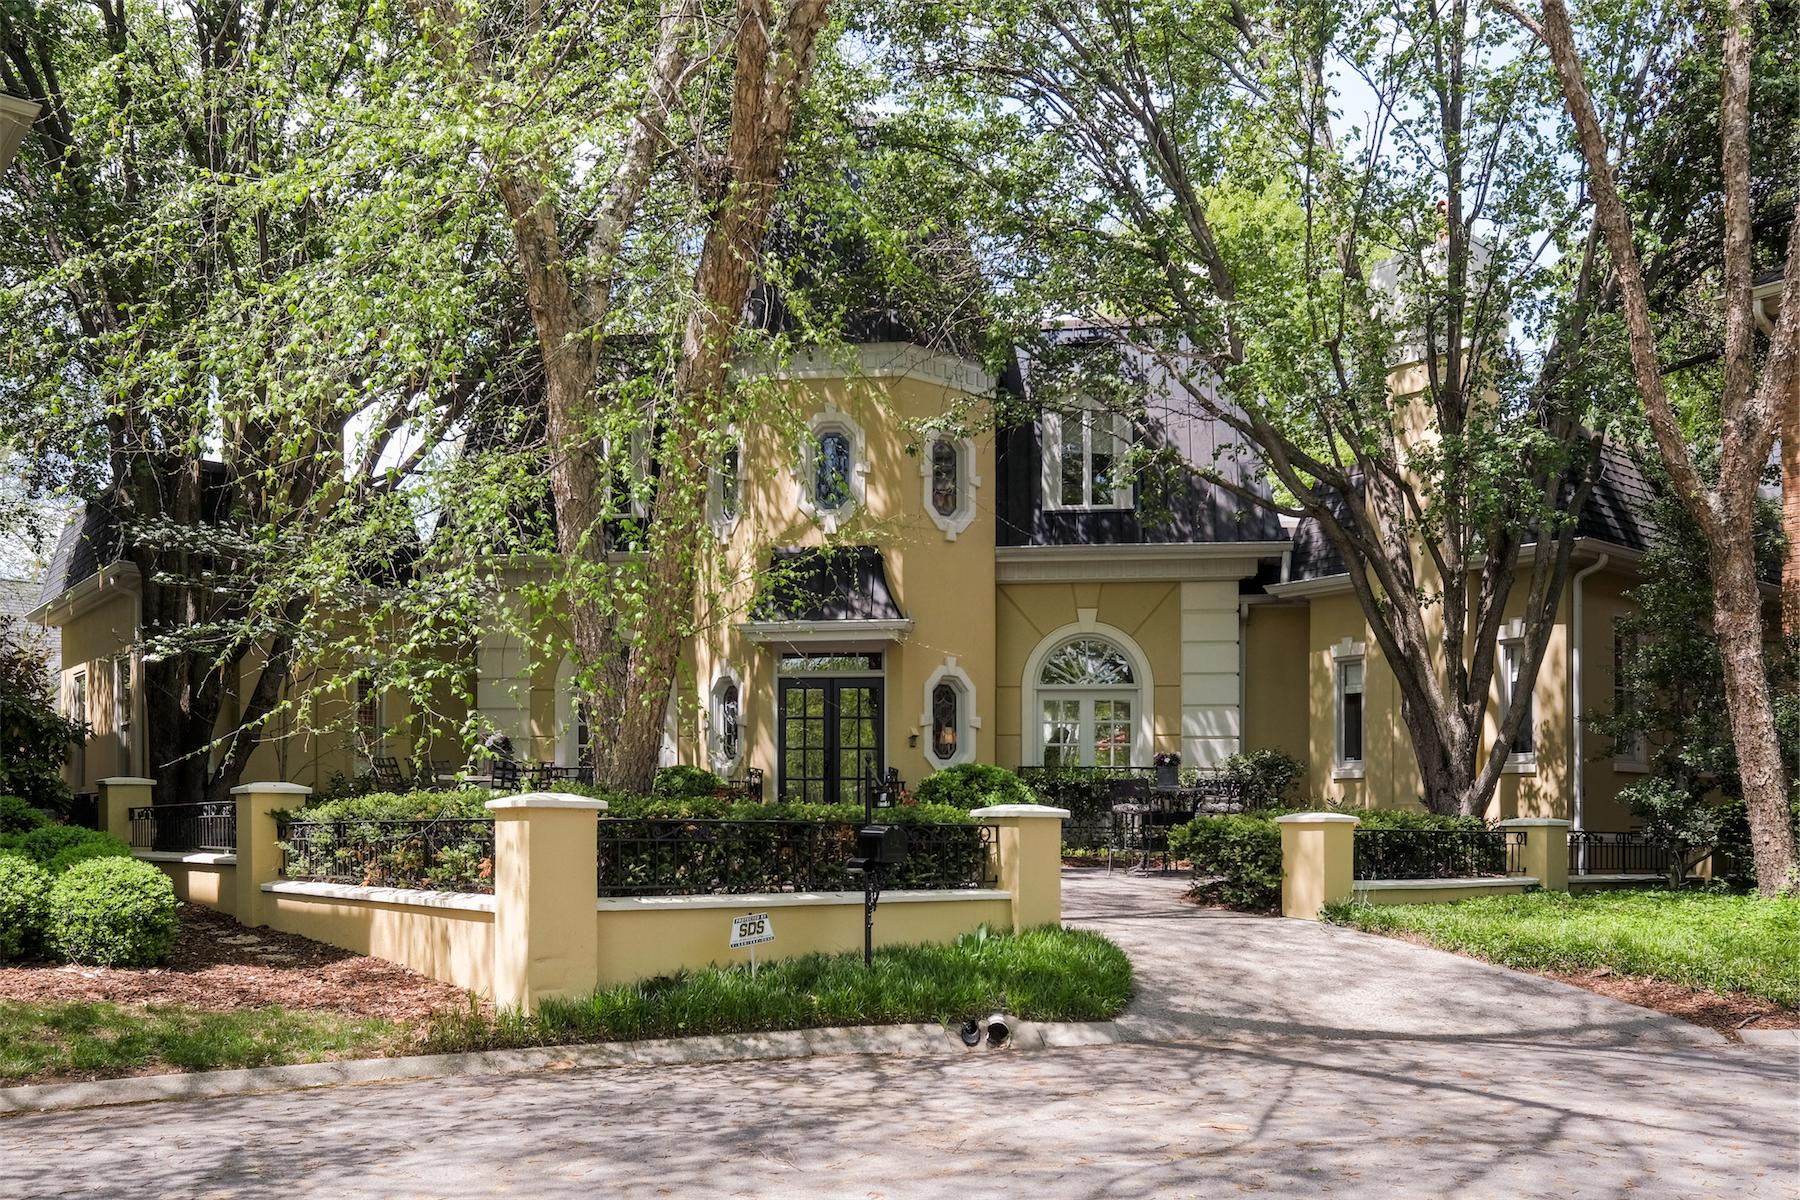 Single Family Home for Sale at Stunning Abbottsford Residence 107 Abbottsford Nashville, Tennessee, 37215 United States